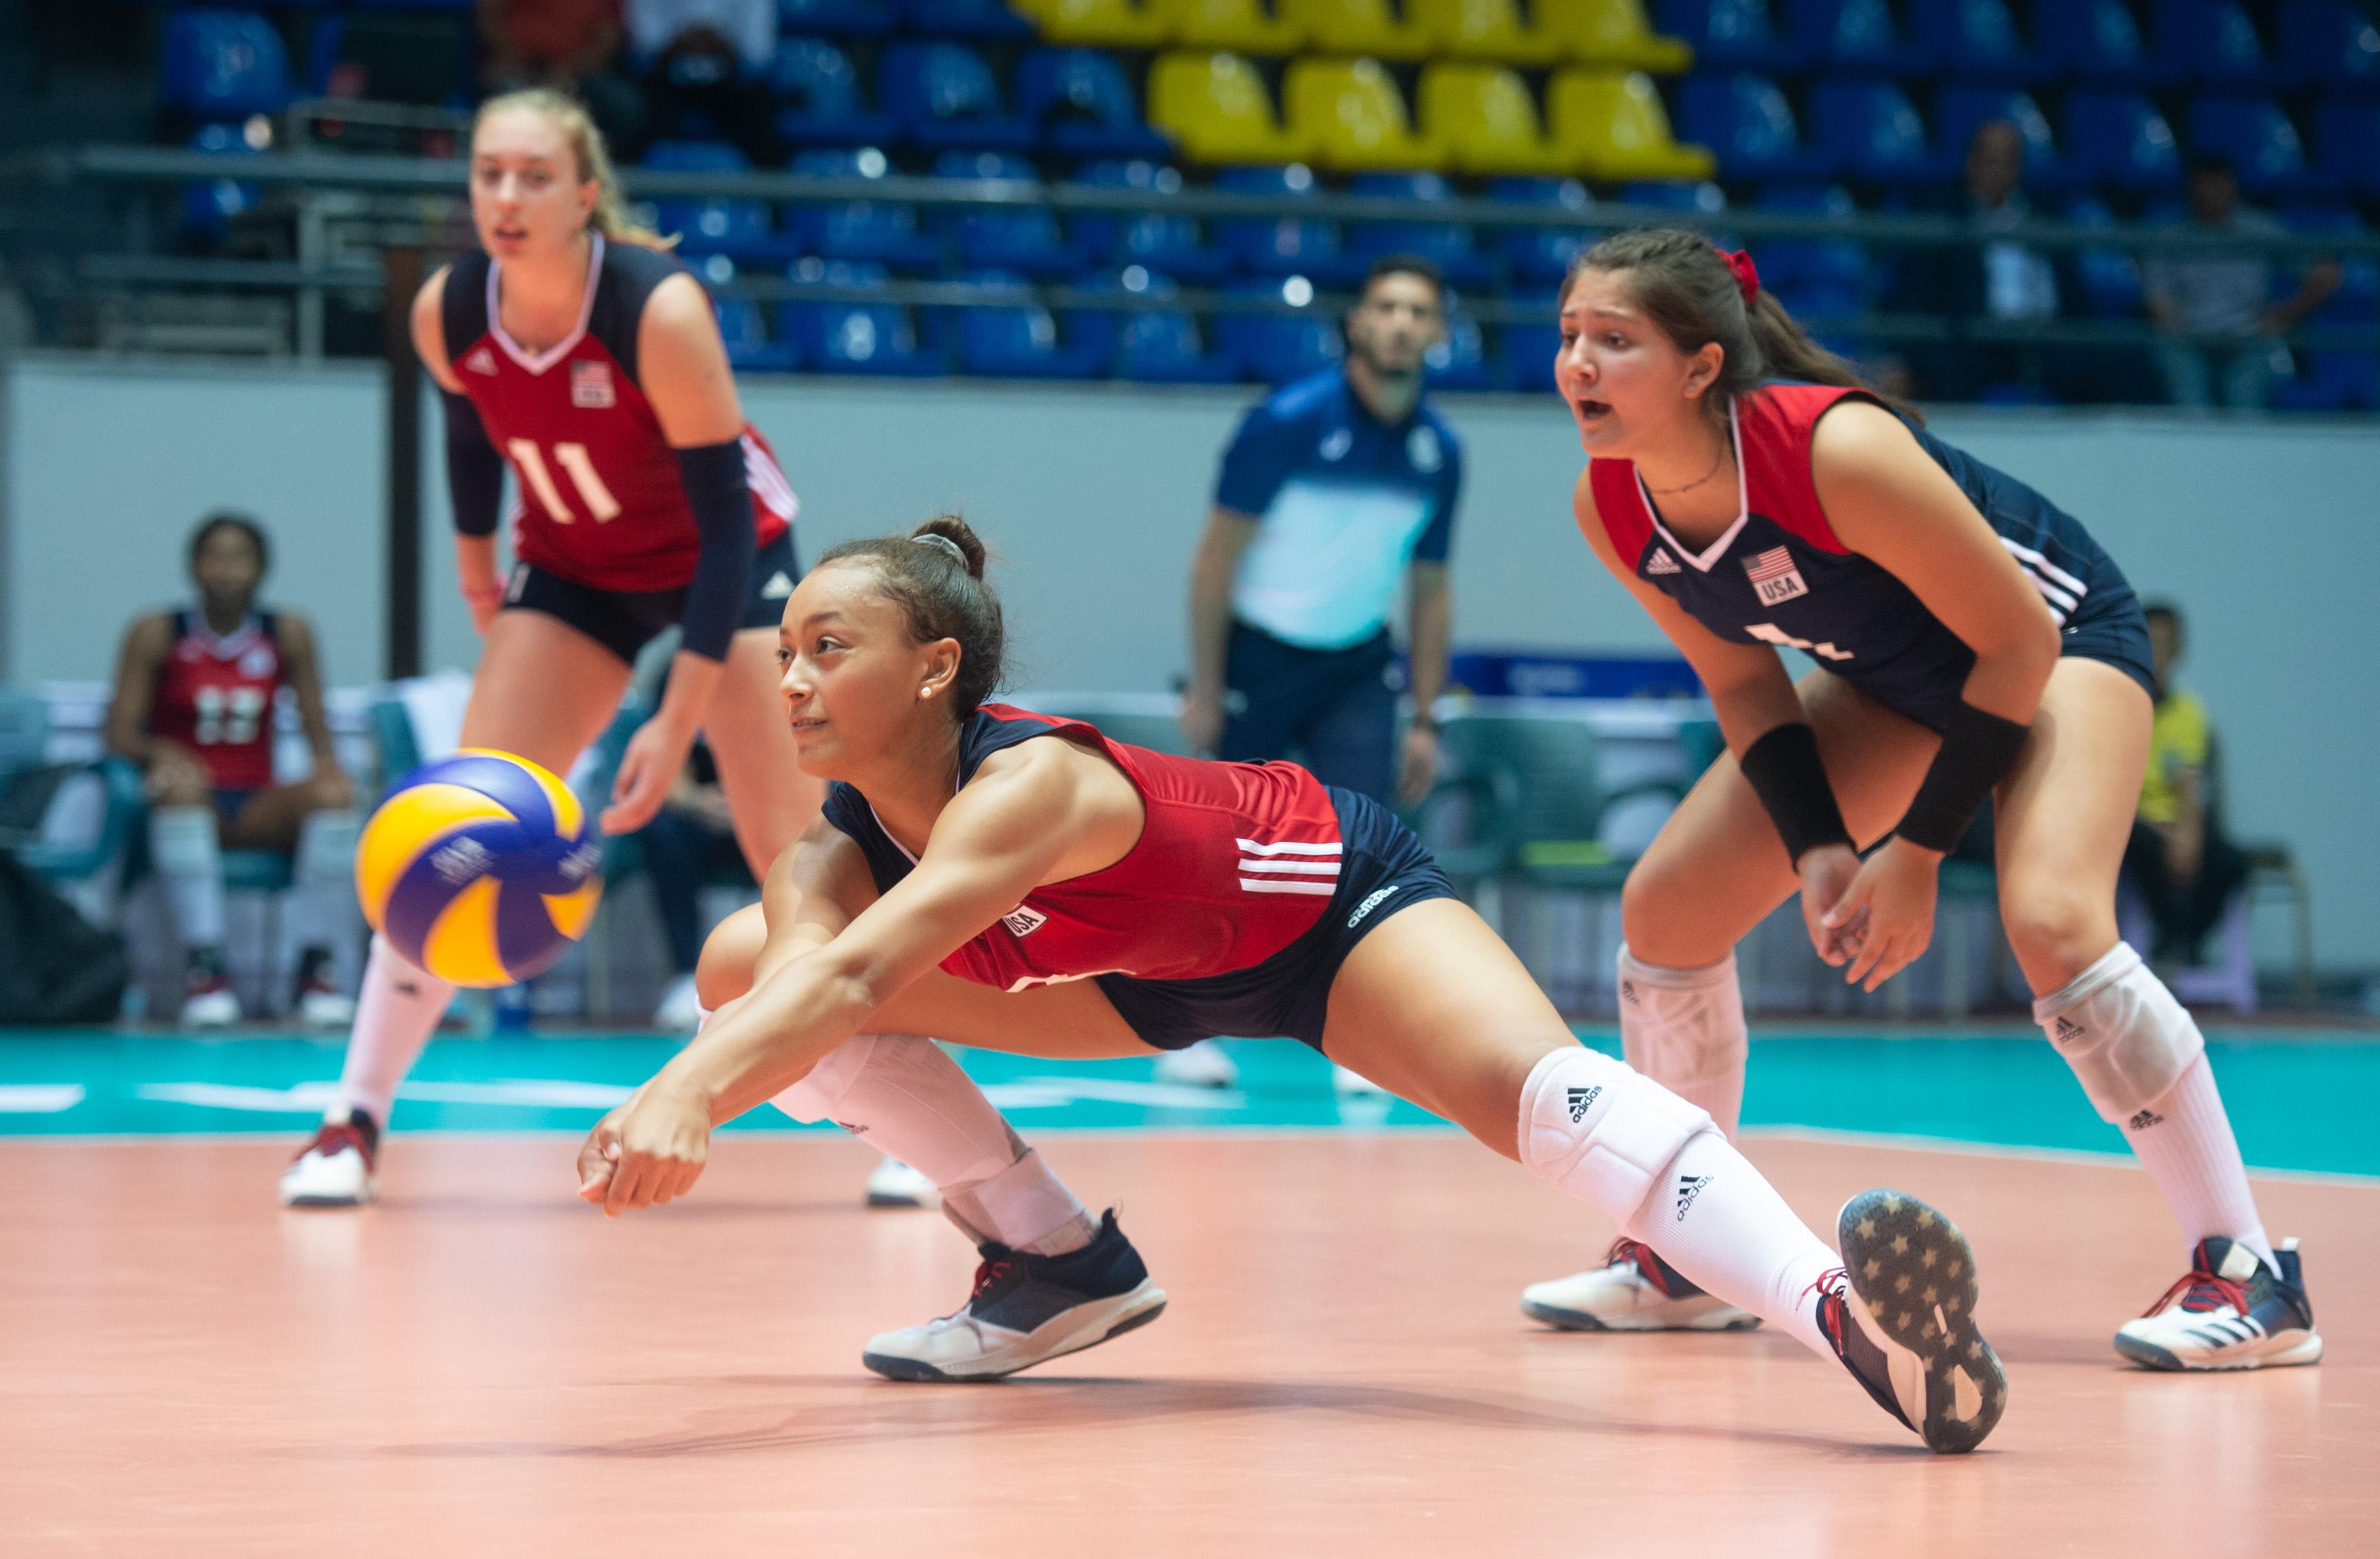 News Italy Usa Seek To Write History In Girls U18 Worlds Final